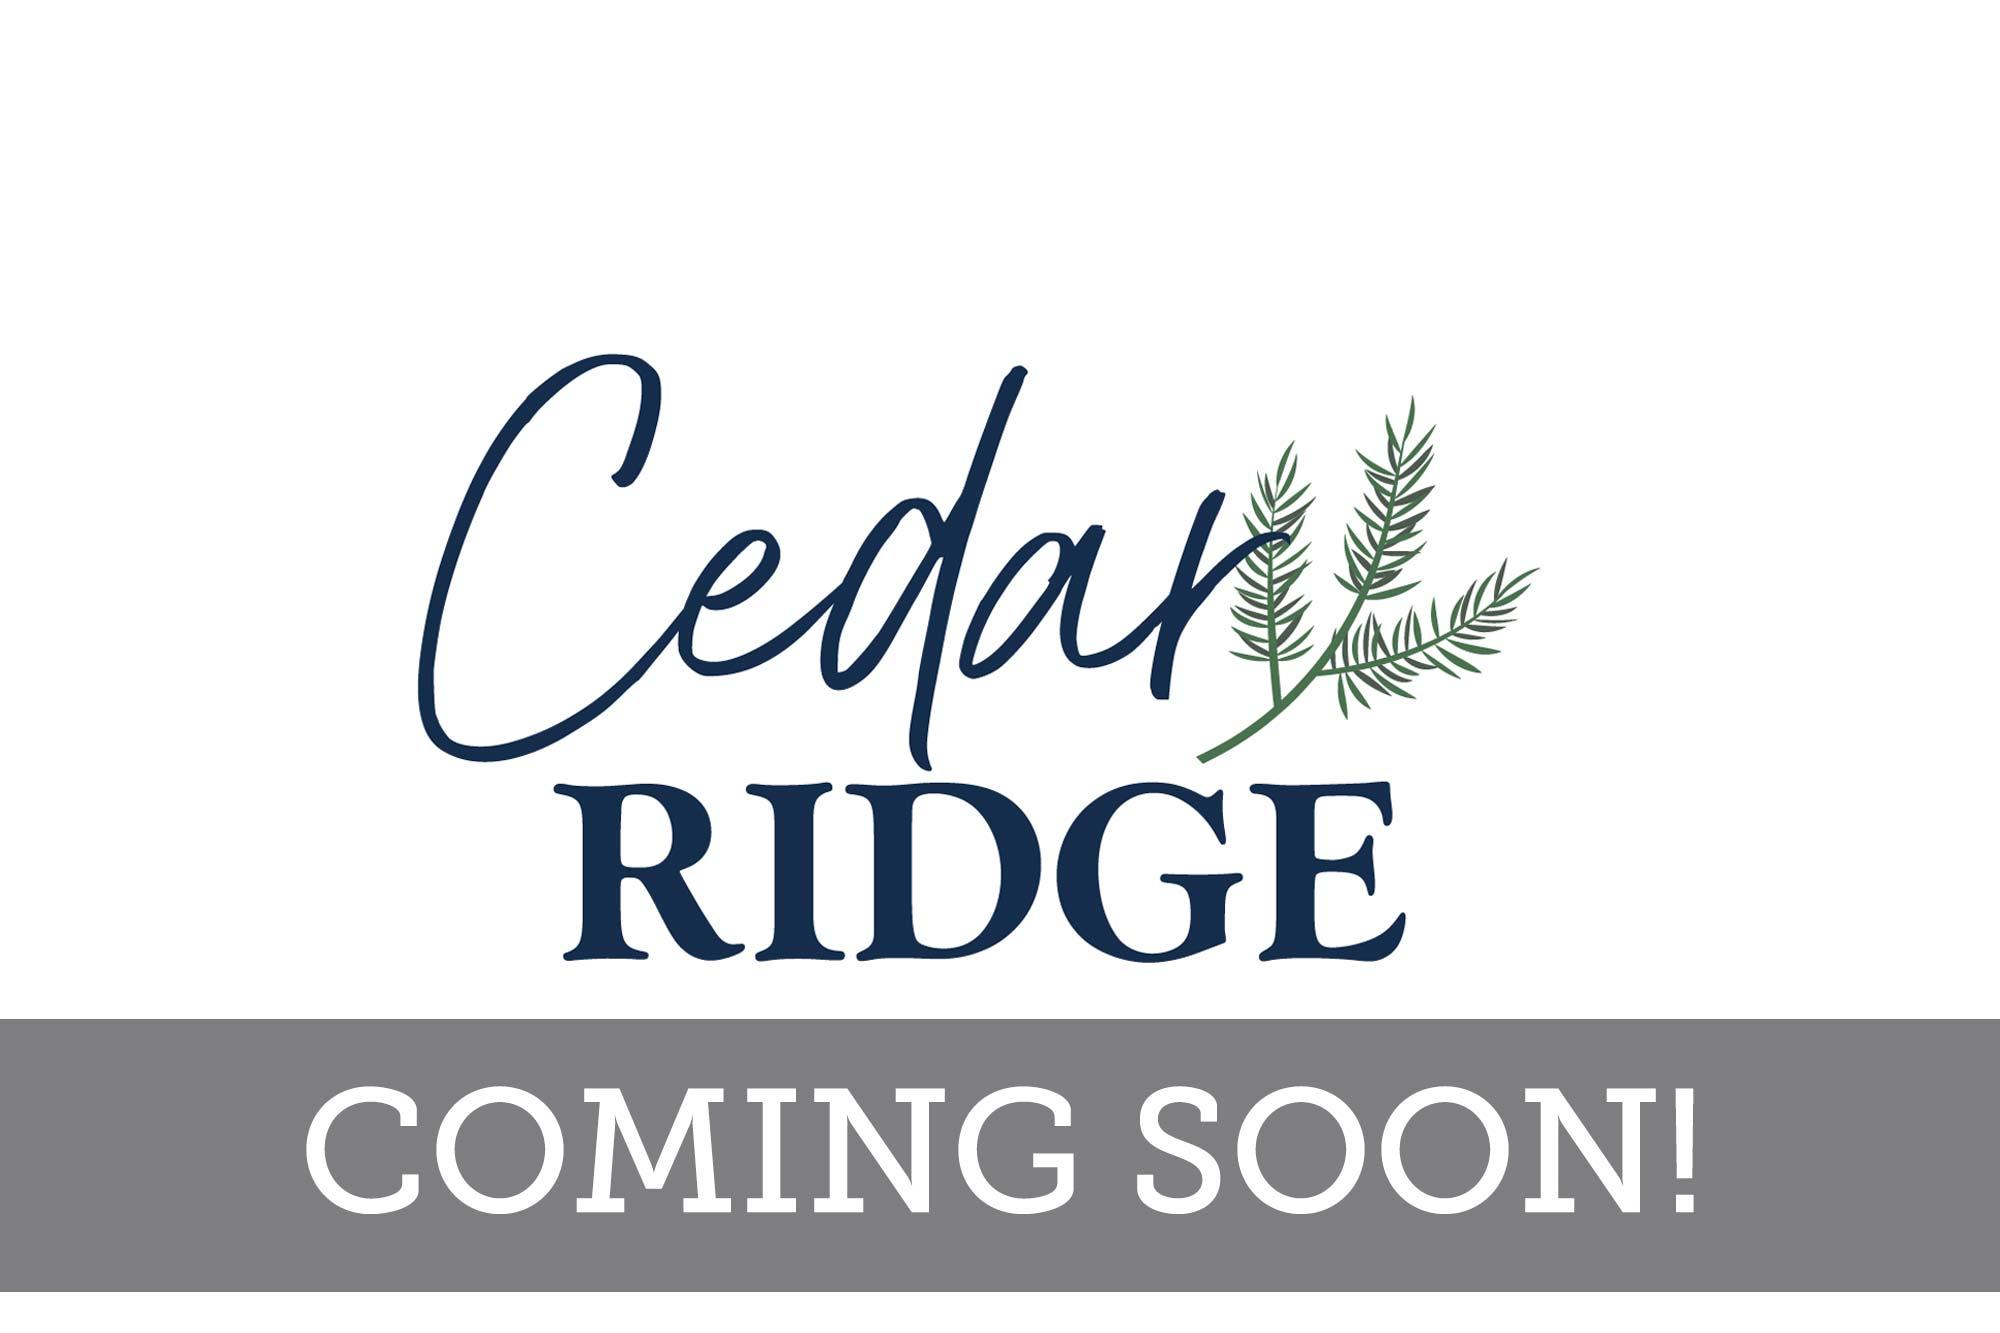 Cedar Ridge - Coming Soon